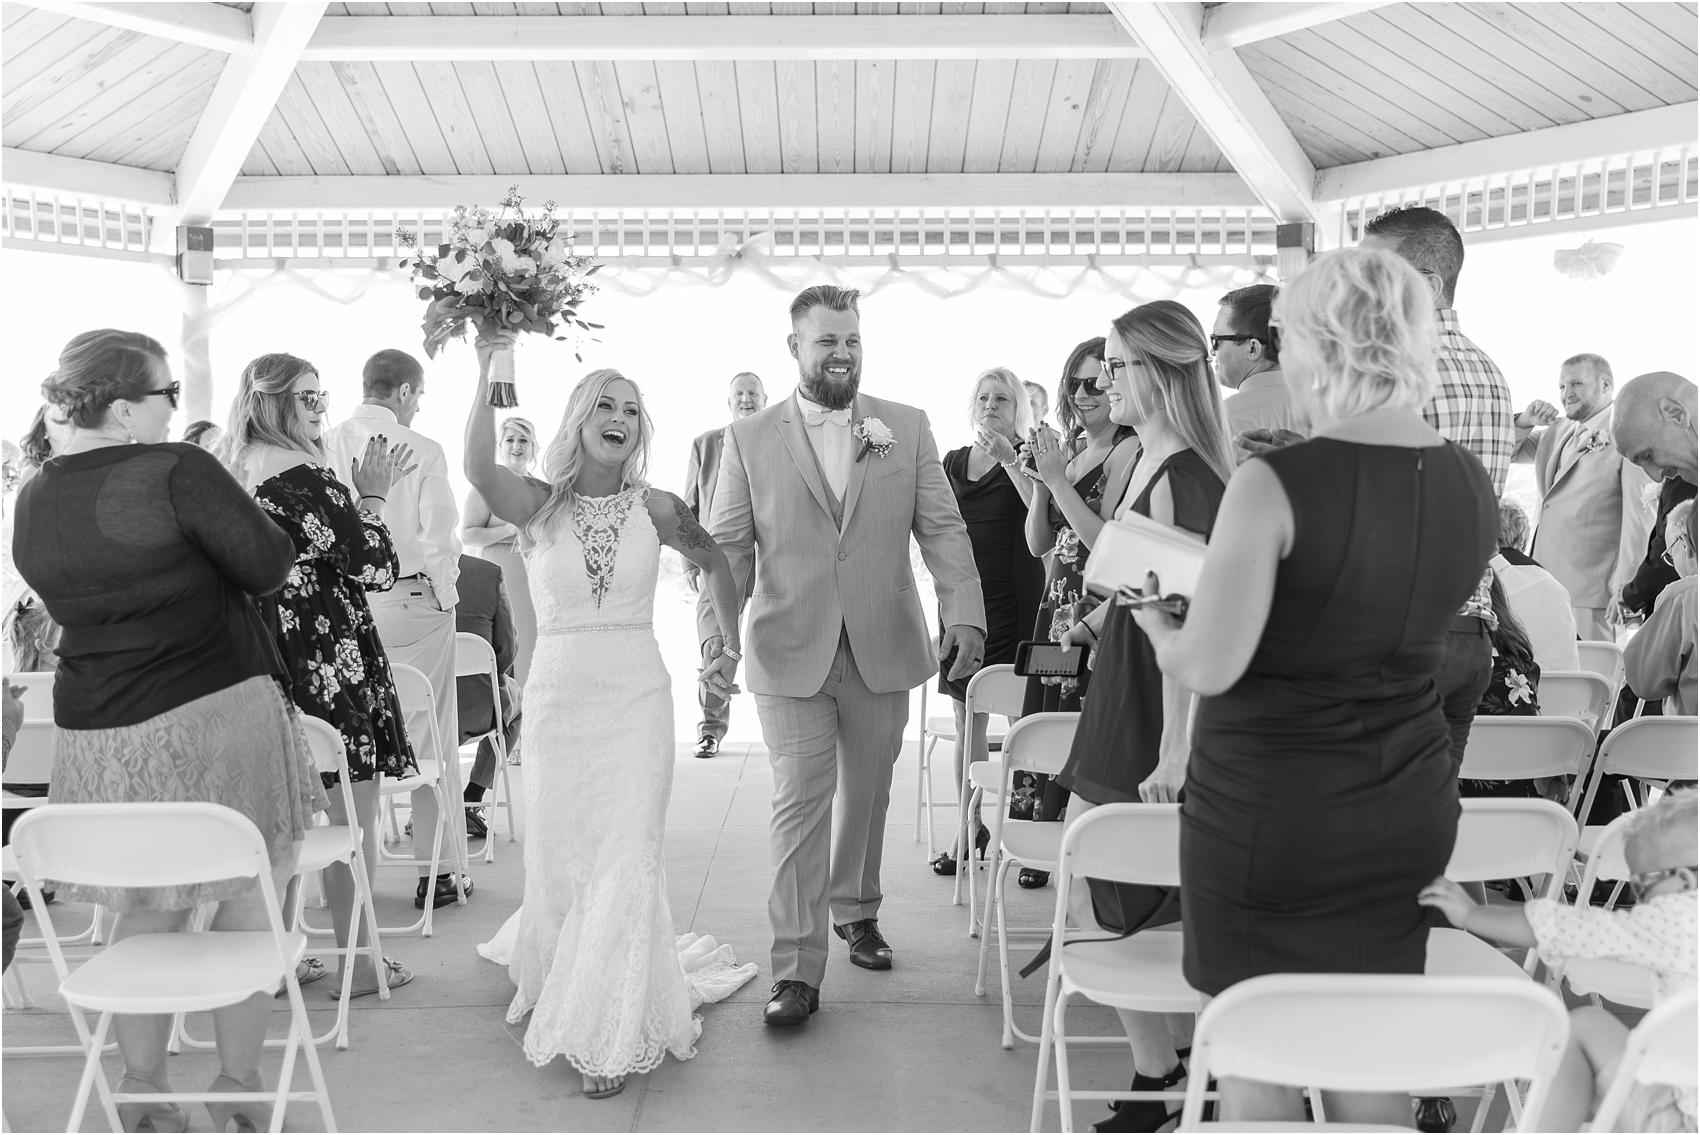 fun-whimsical-beach-wedding-photos-in-st-joseph-michigan-by-courtney-carolyn-photography_0073.jpg